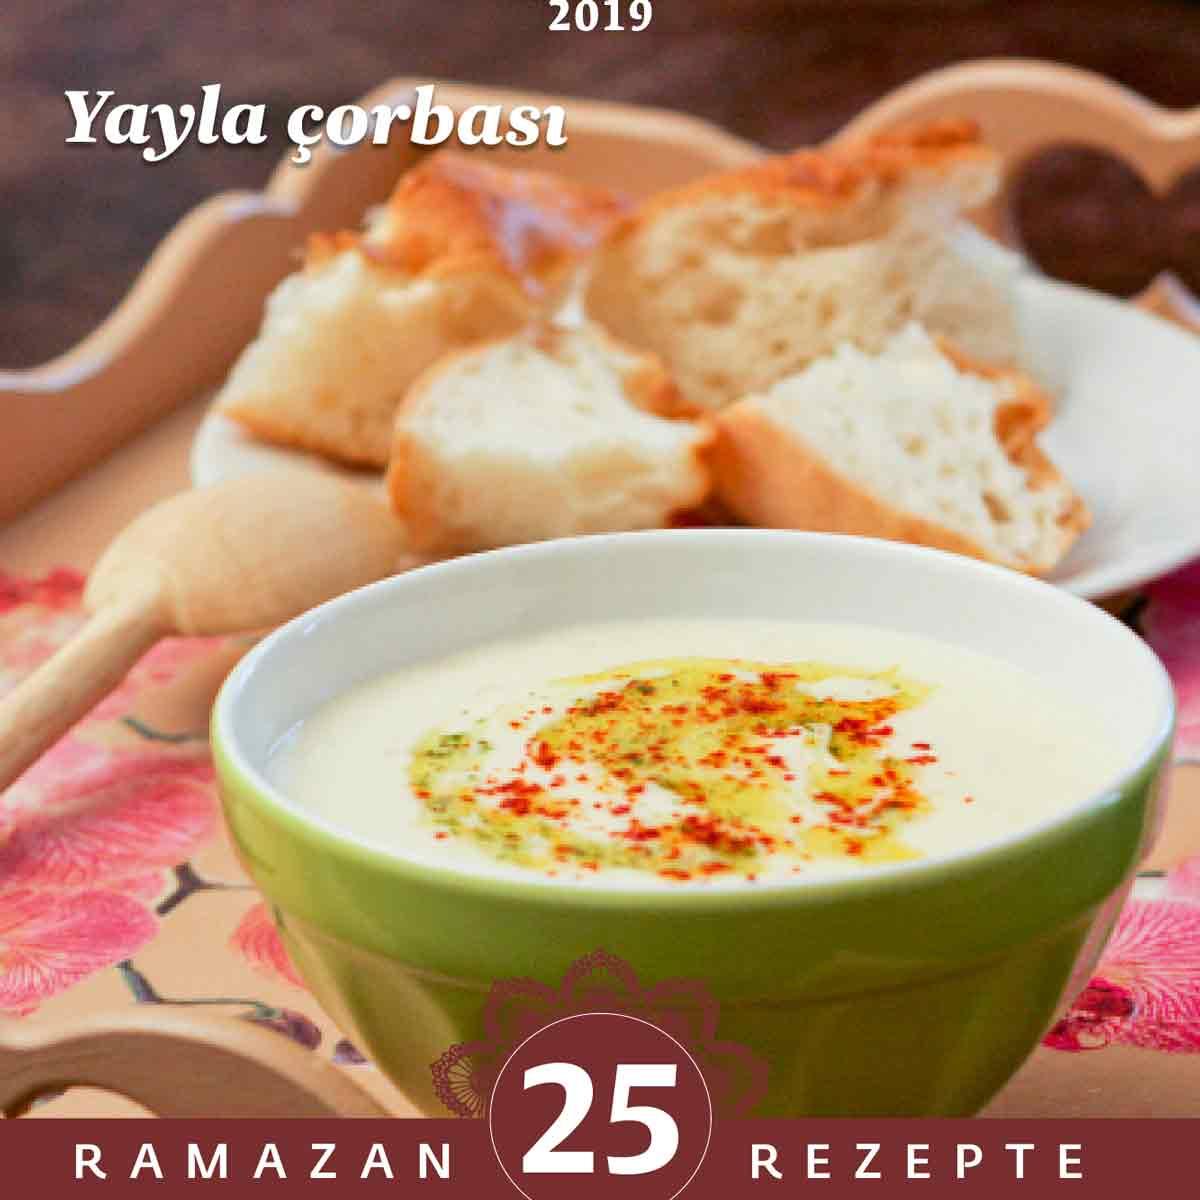 Ramadan 2019 jpeg 25